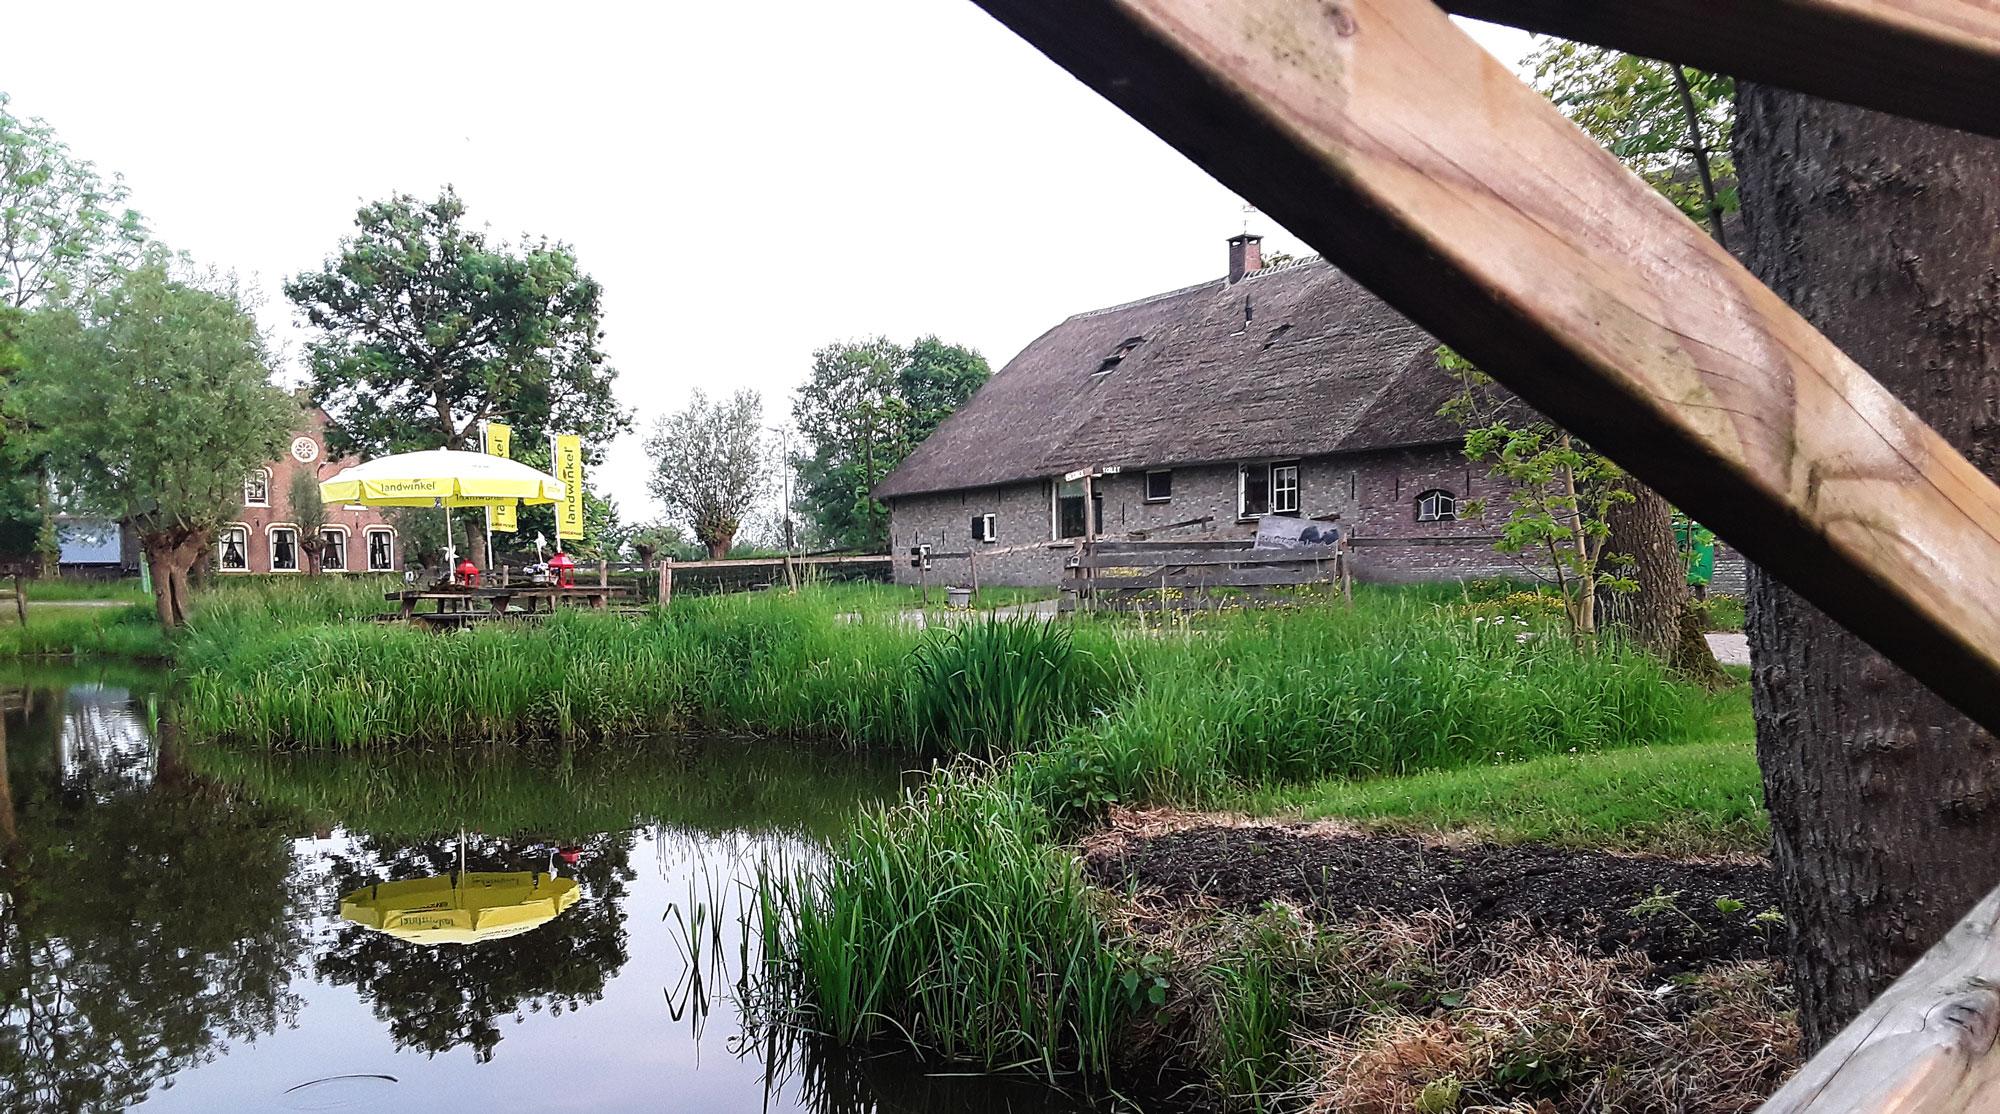 picknickplaats fietsroute rust polsbroek landwinkel kaas maken